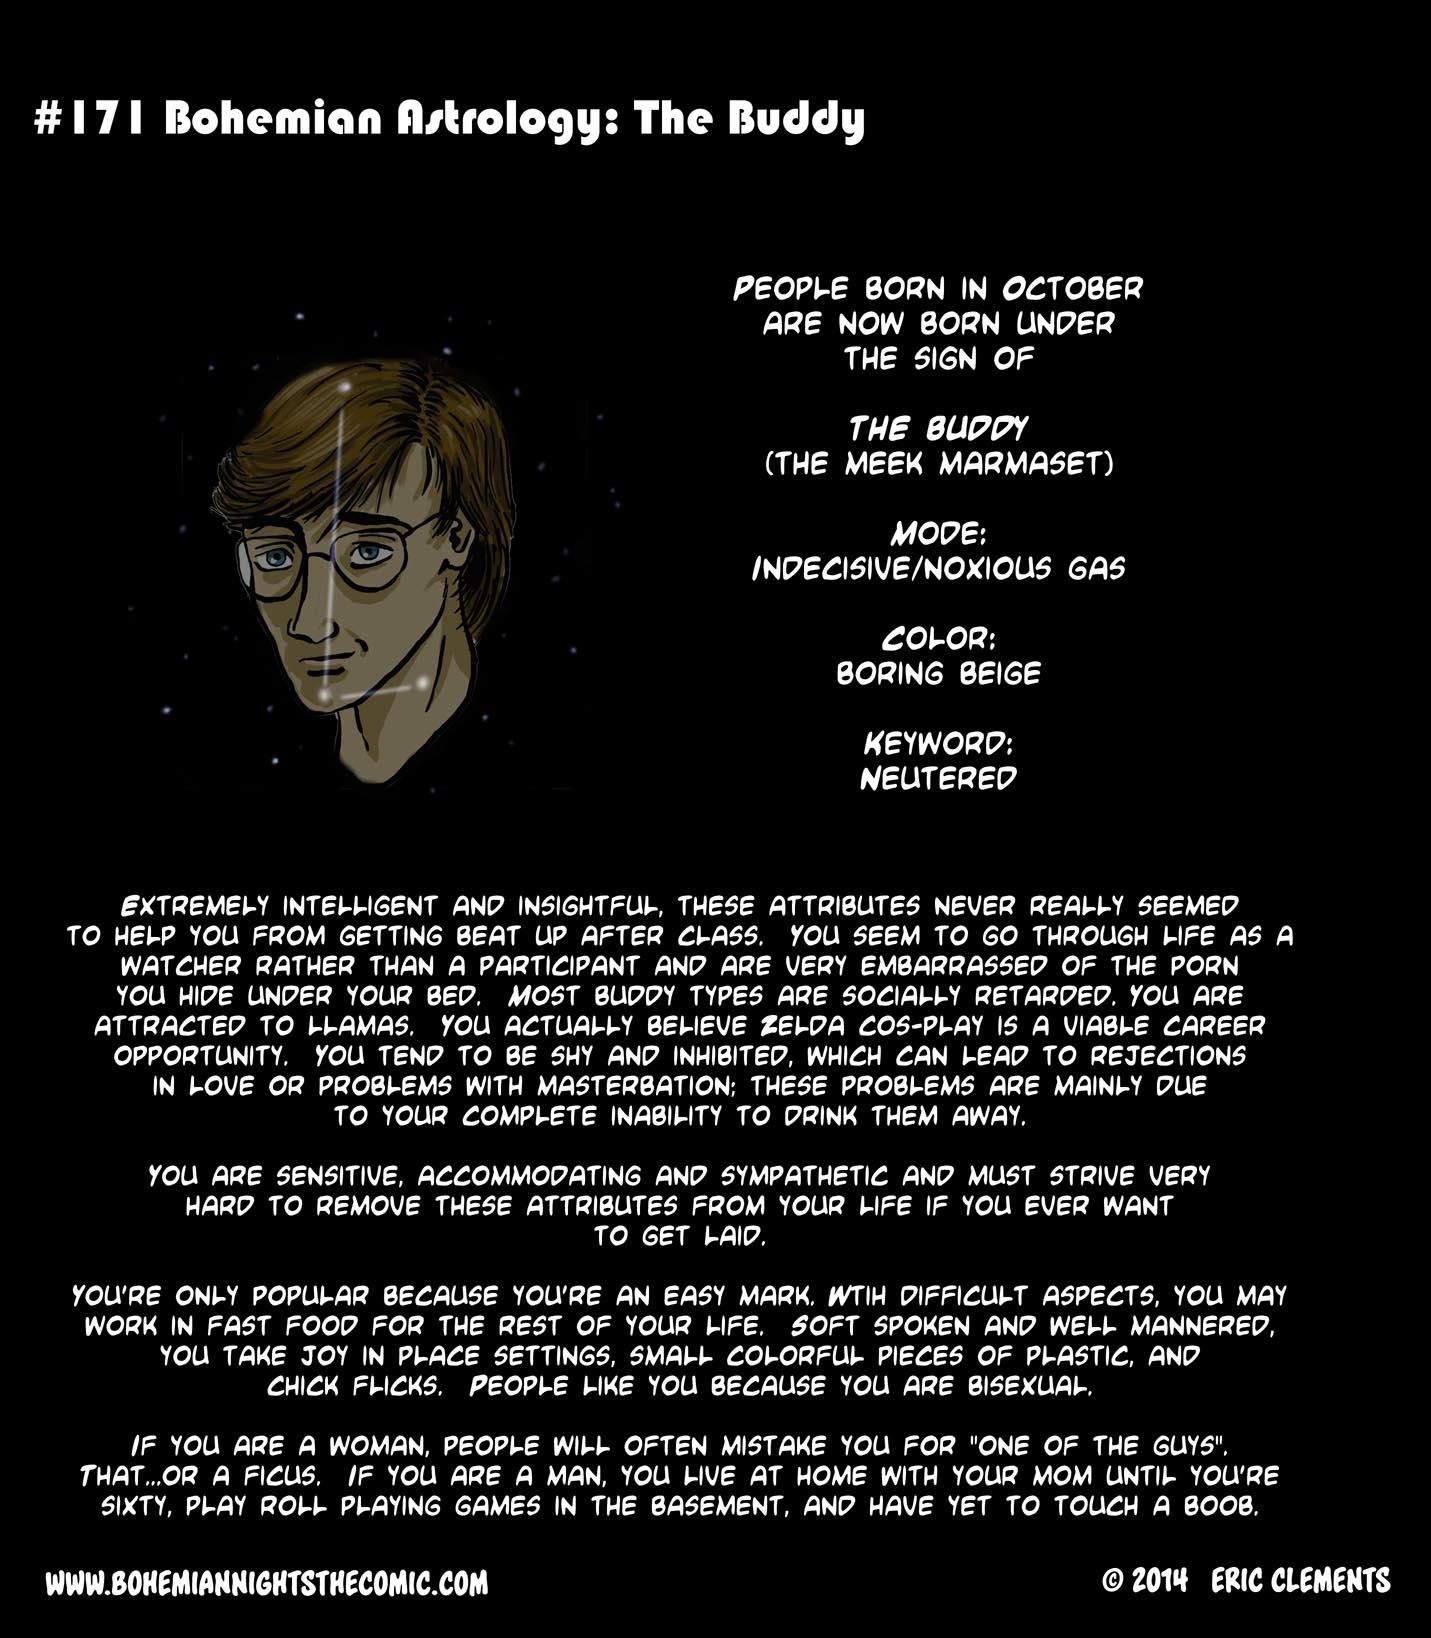 #171 Bohemian Astrology: The Buddy